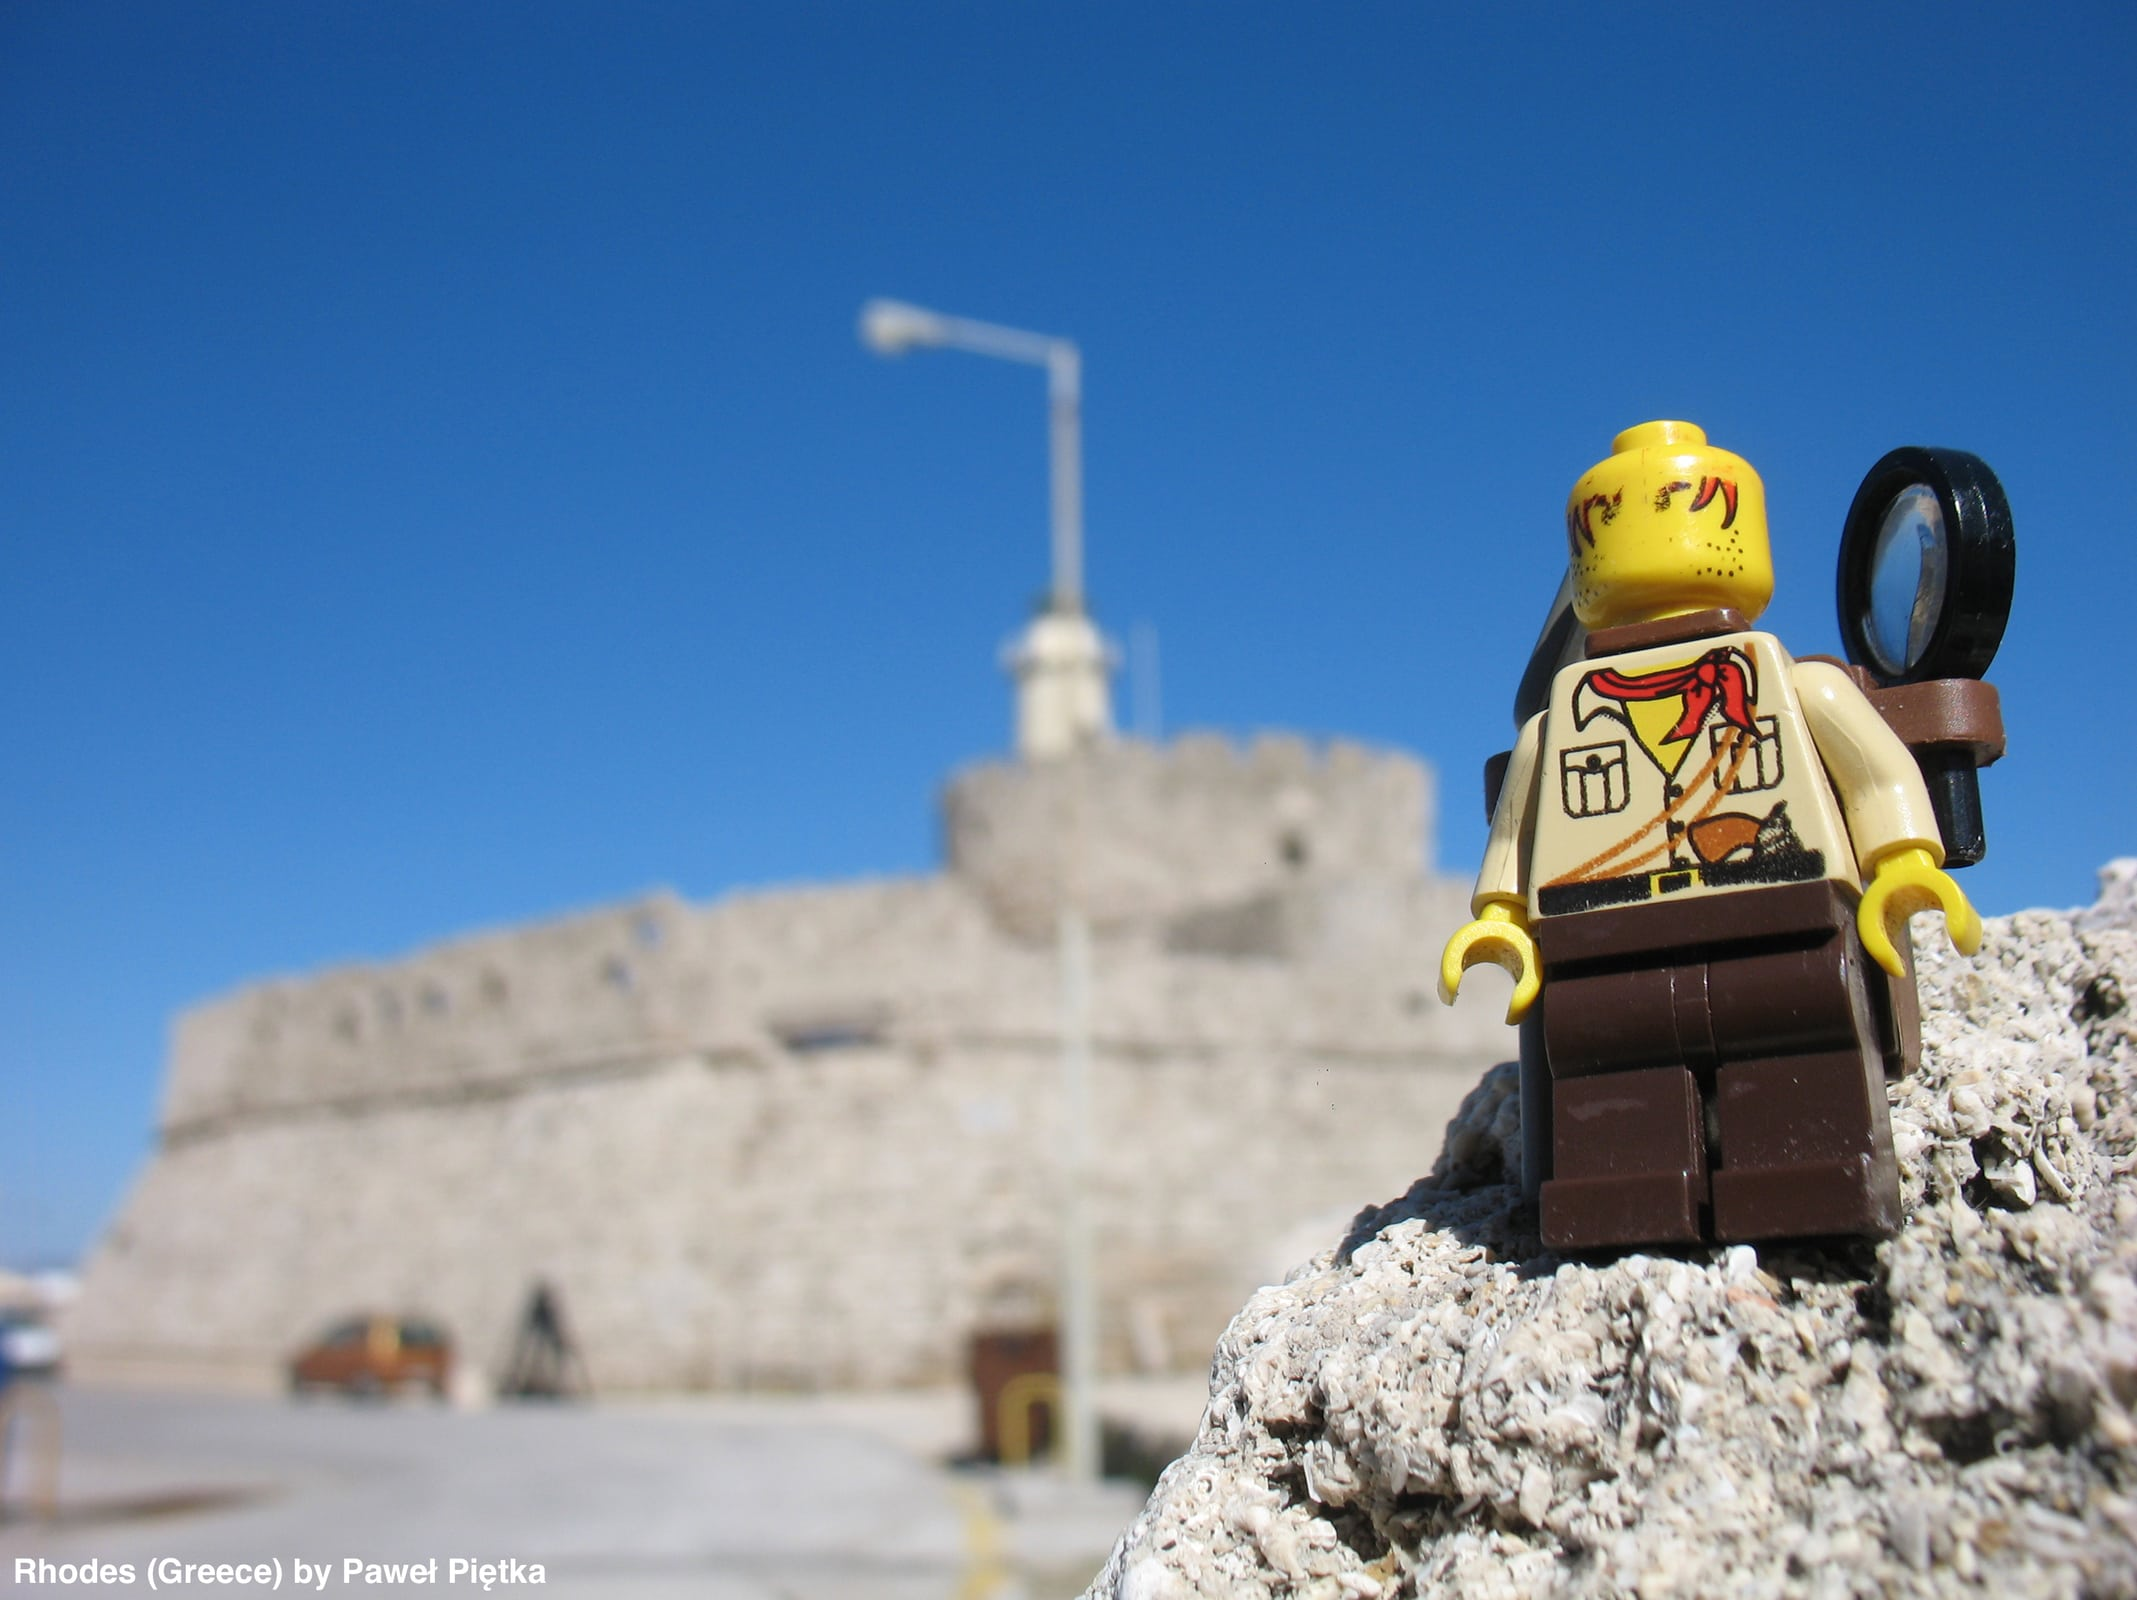 Rhodes (Greece) - Fort Saint Nicolas